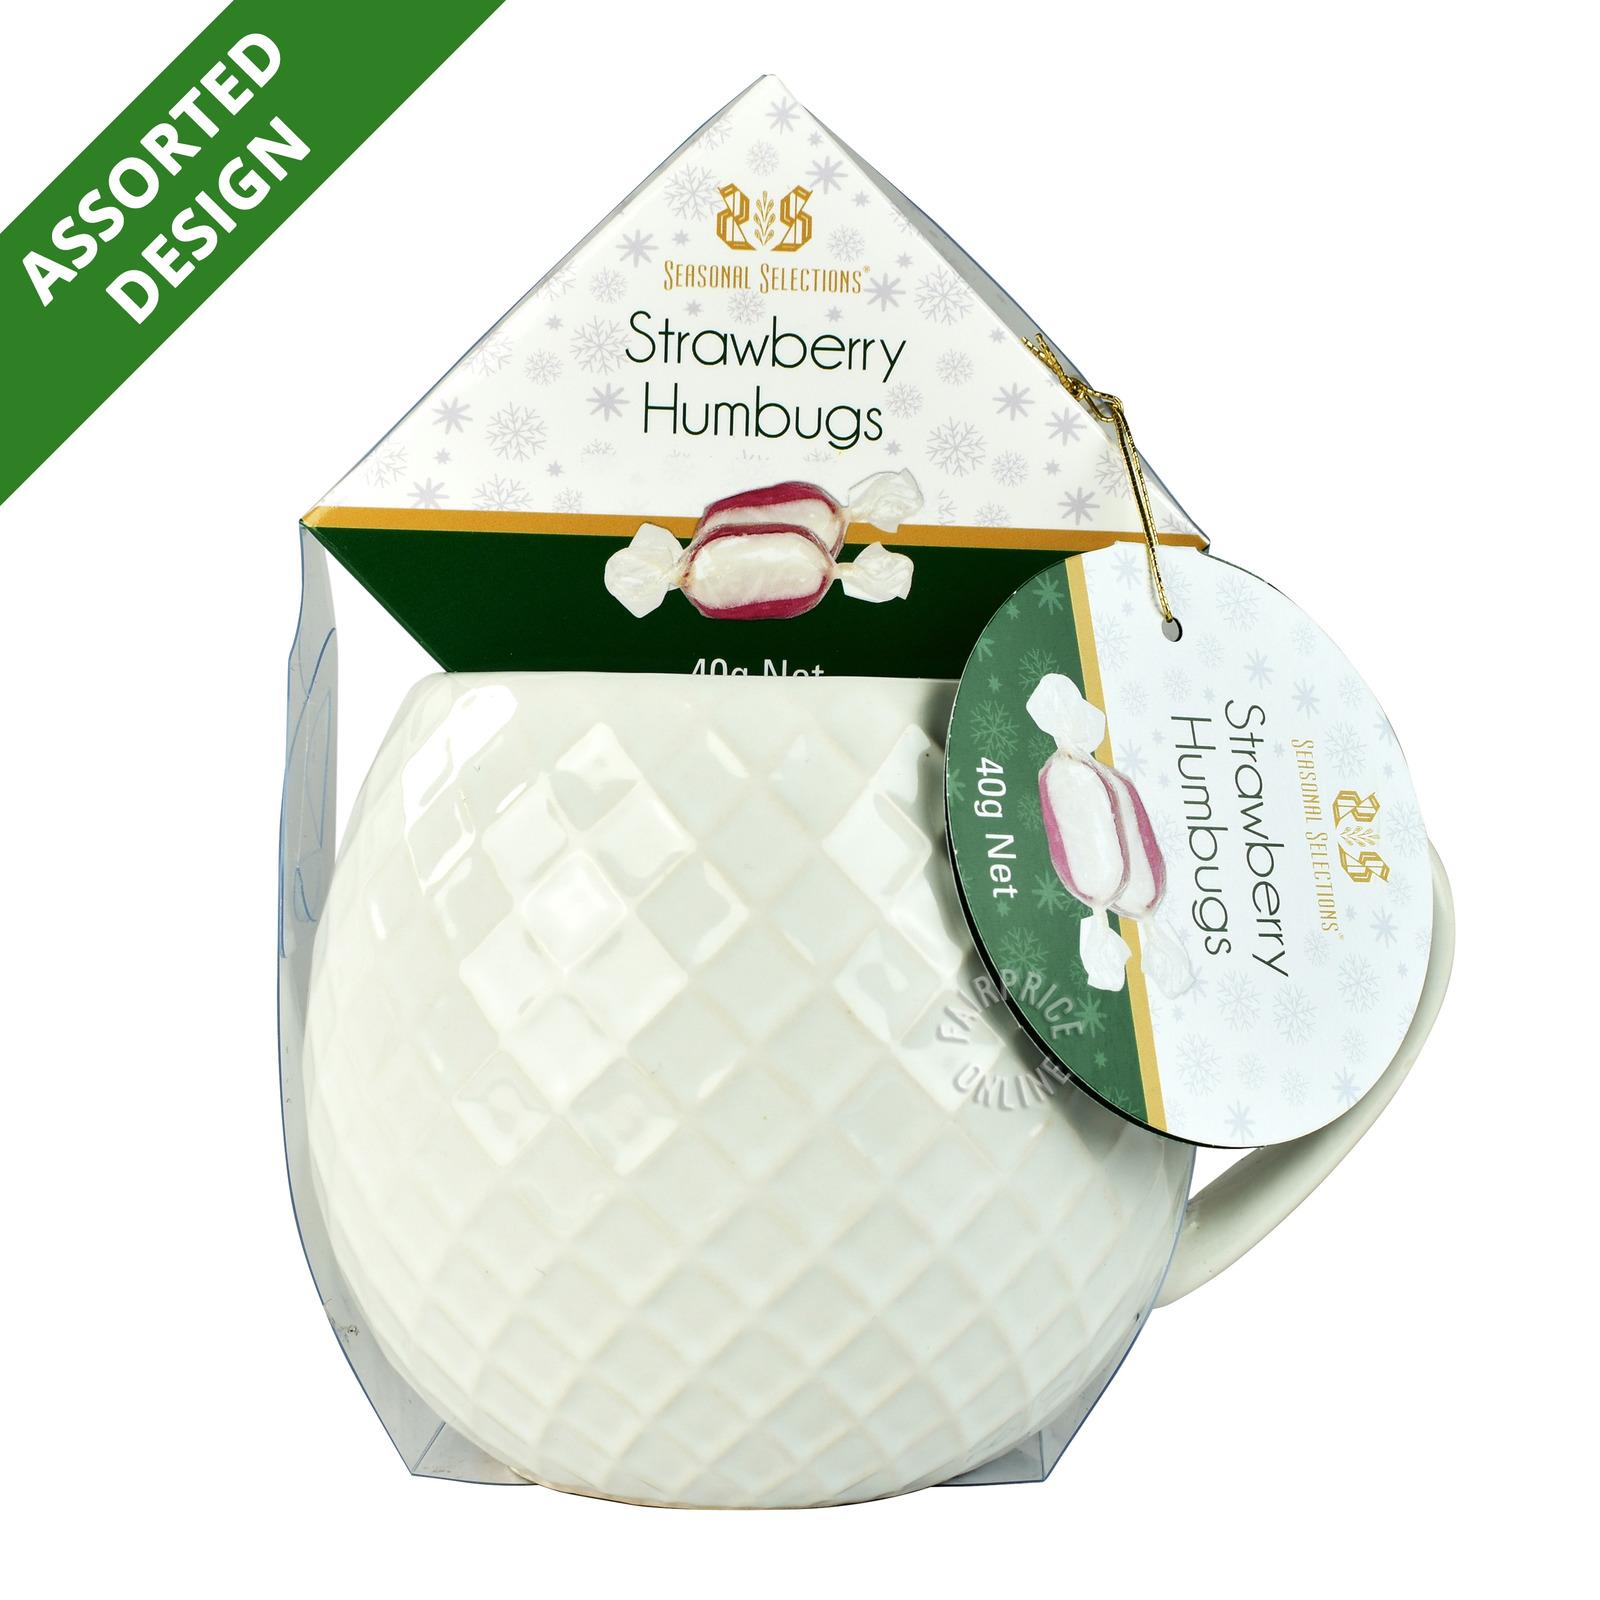 Seasonal Selections Humbugs with Mug - Strawberry